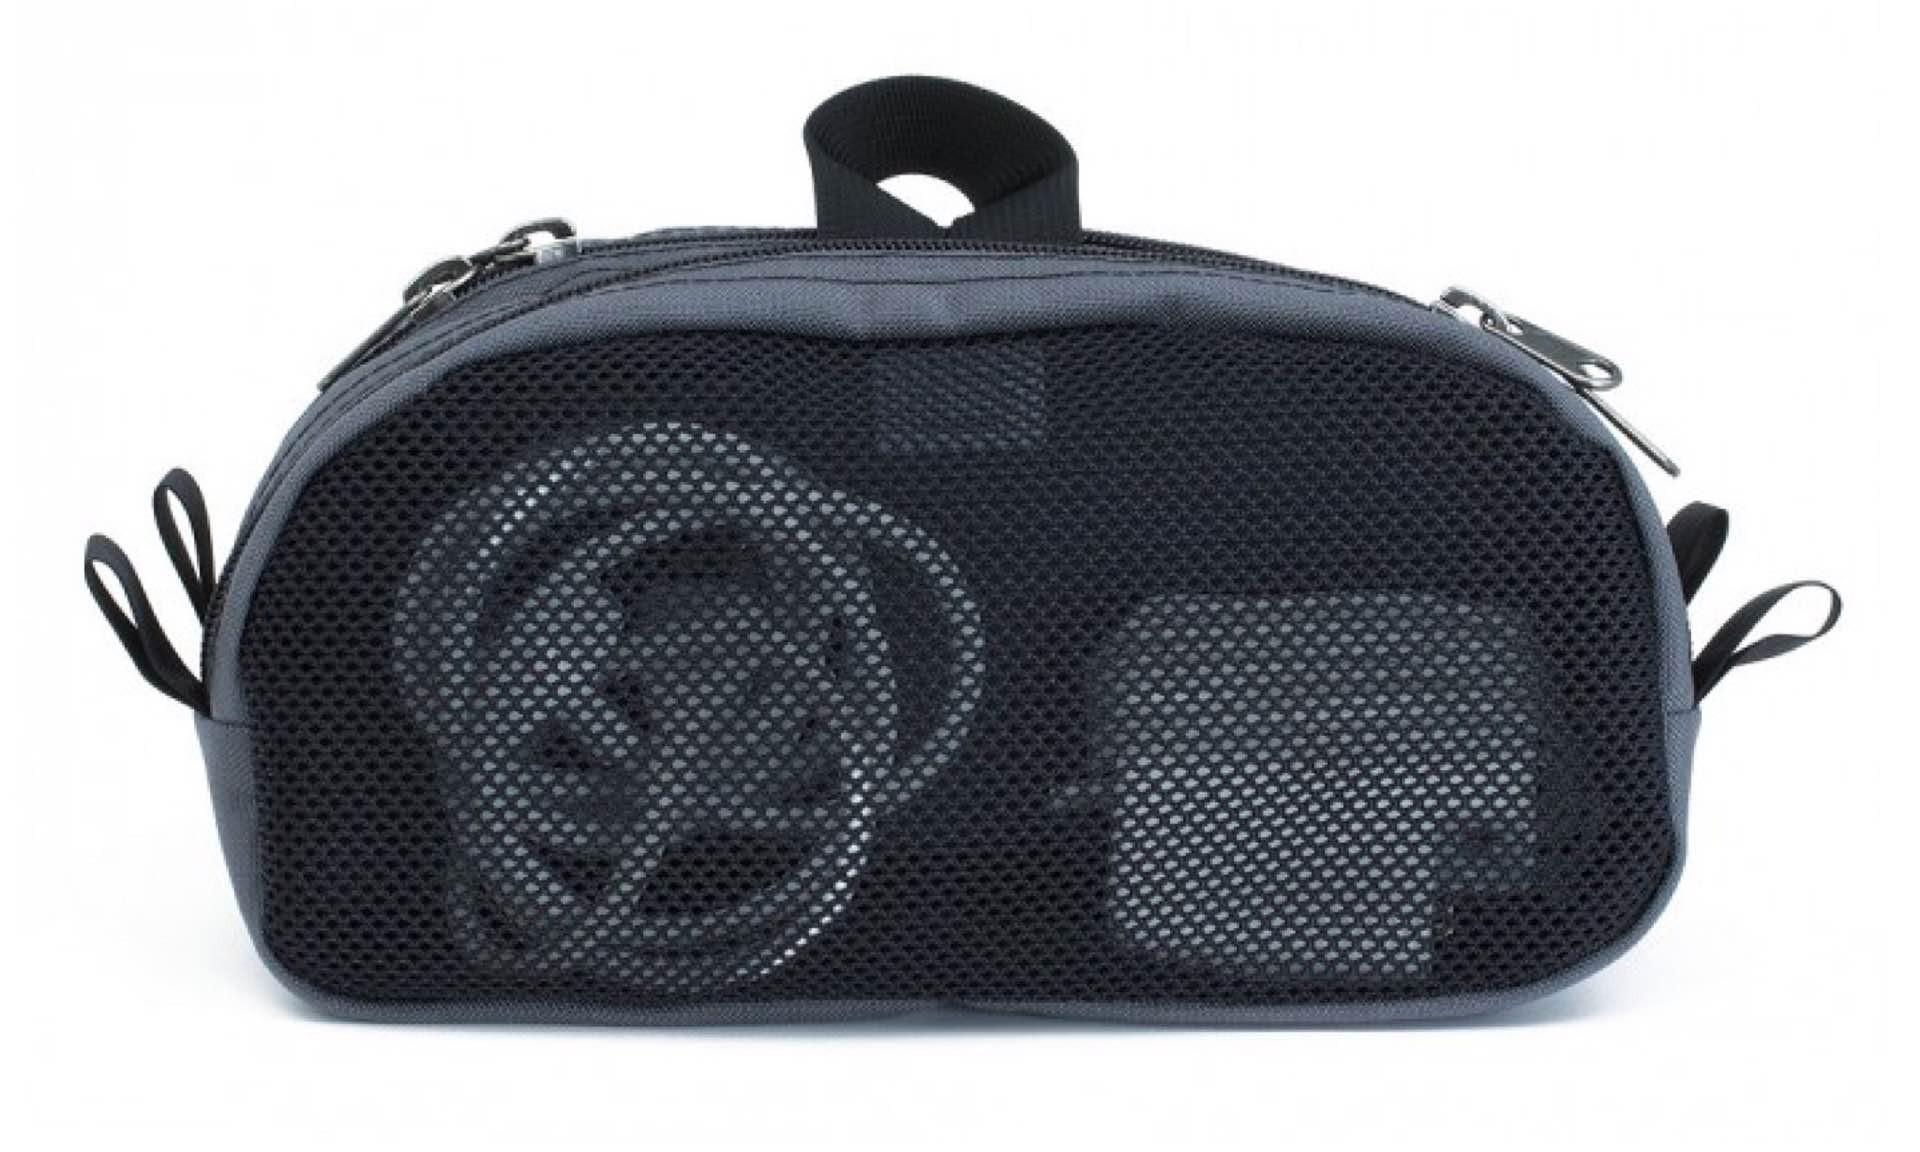 Tom Bihn's Snake Charmer organizer pouch. ($30)